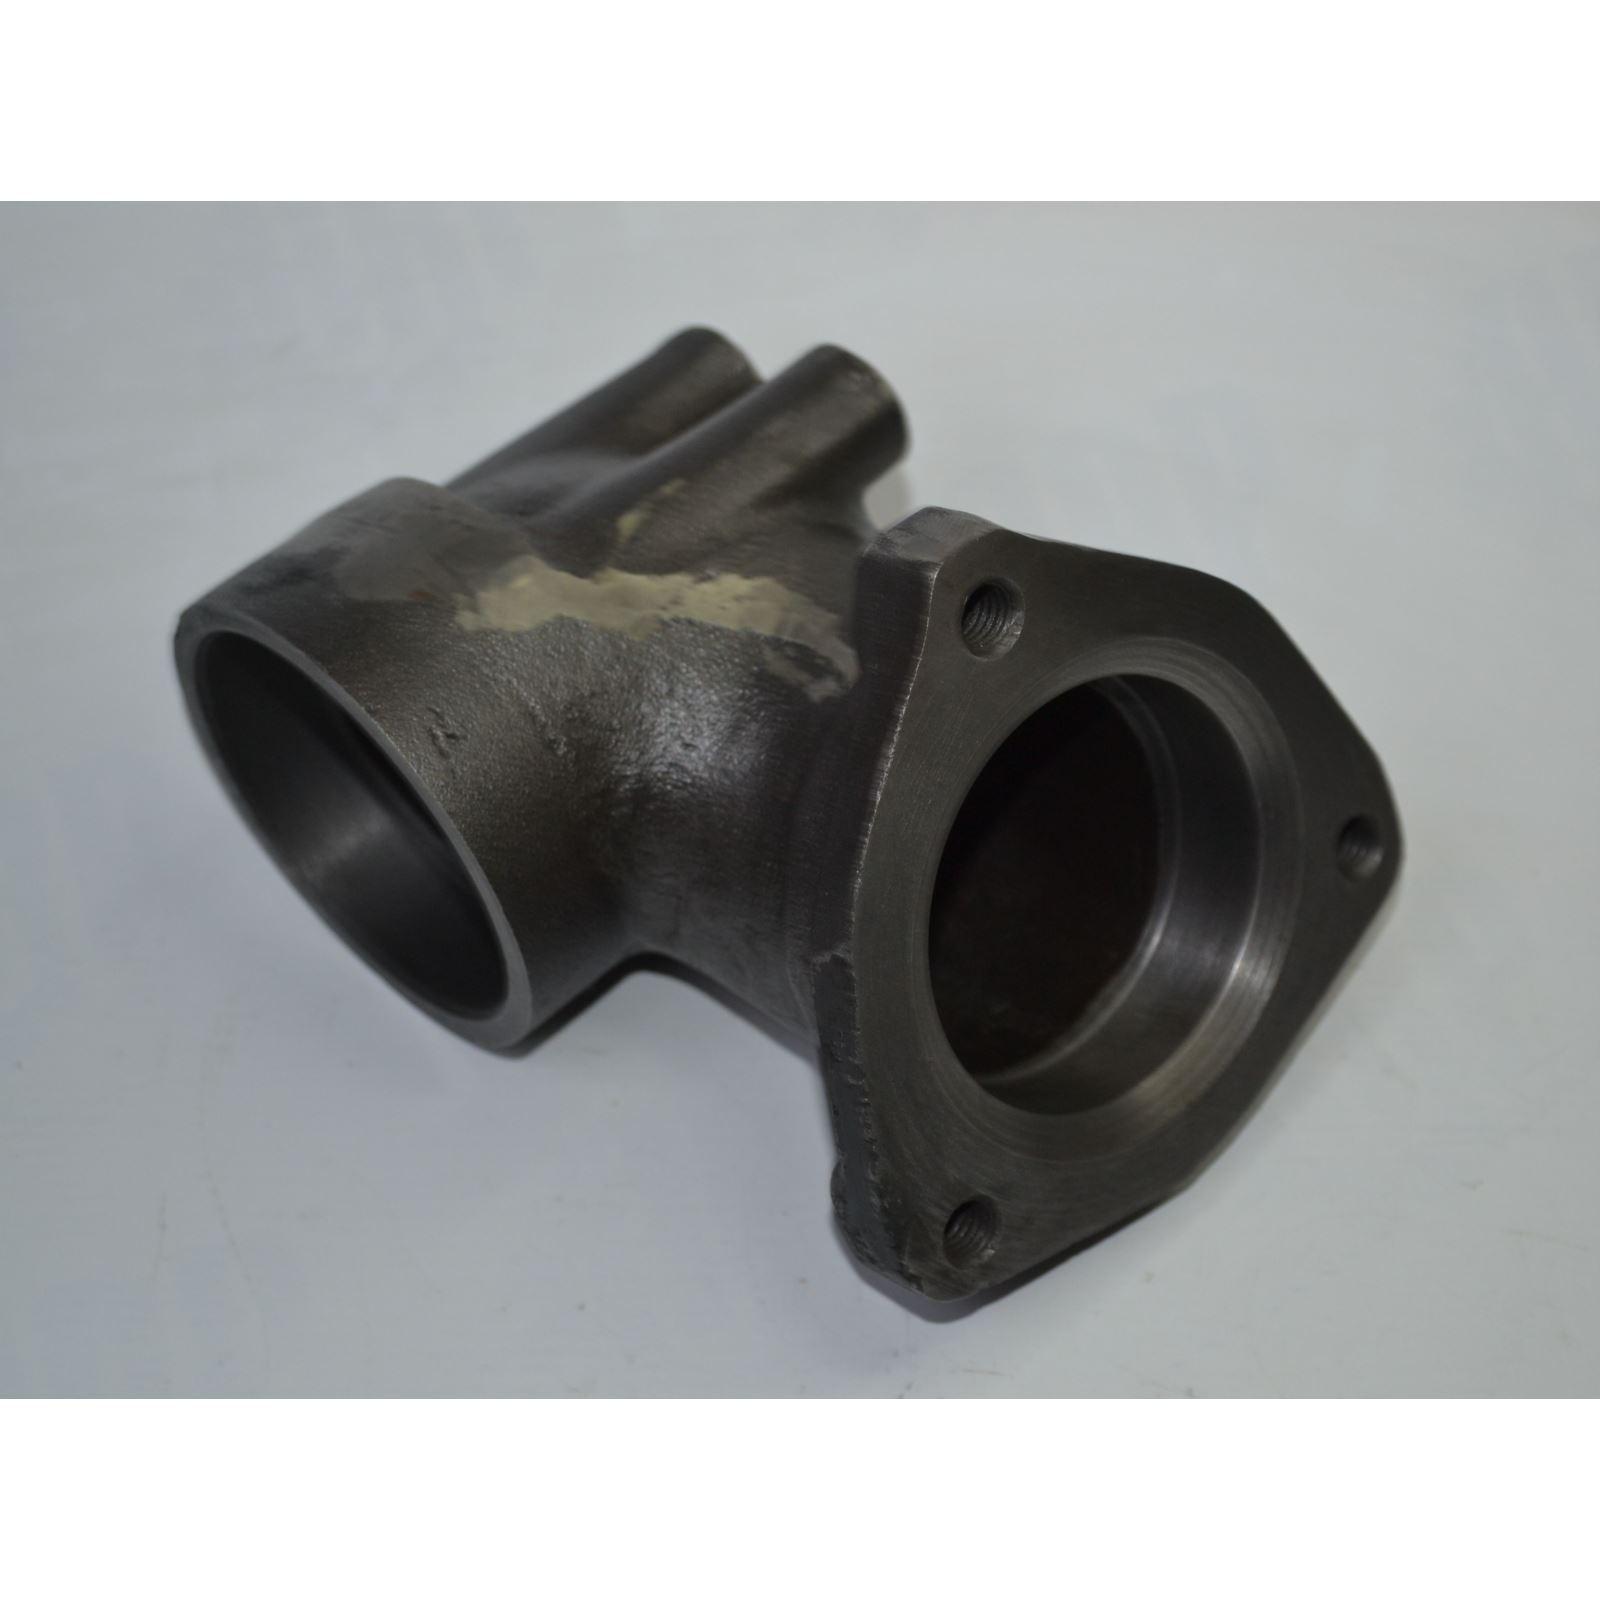 Kolanko turbosprężarki JCB 3CX 4CX 526S 532 537